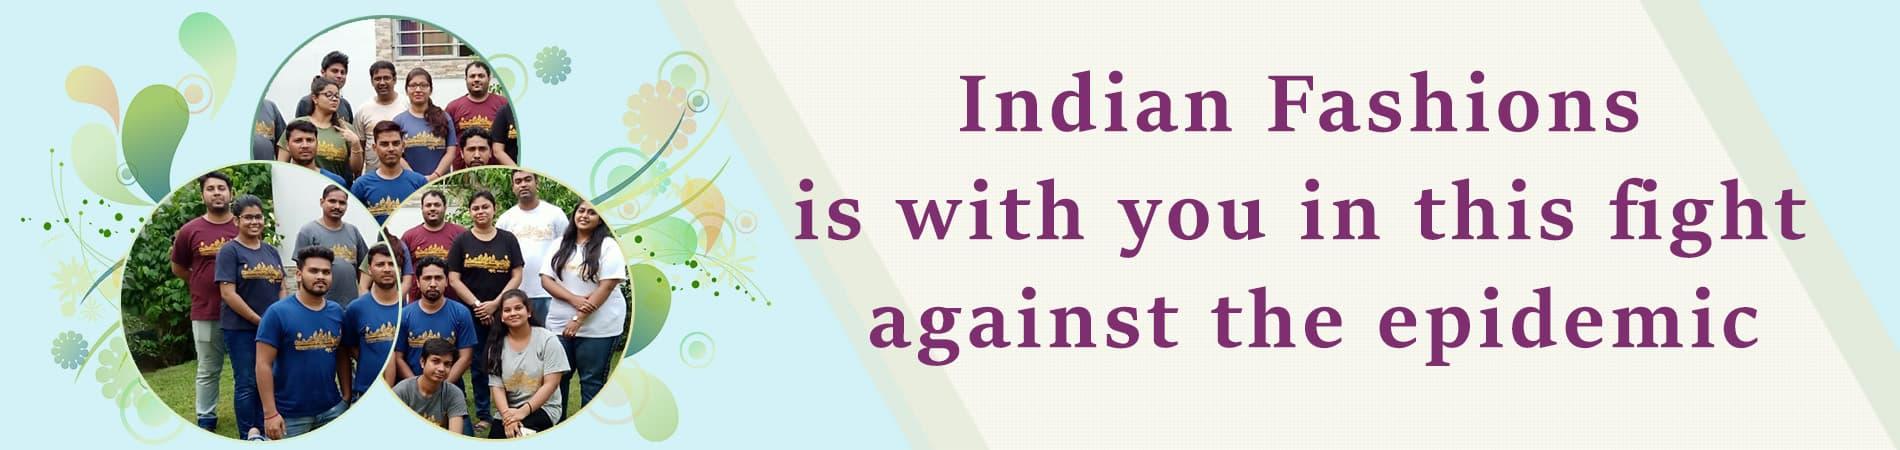 1586261598_Indian_Fashions_COVID19.jpg